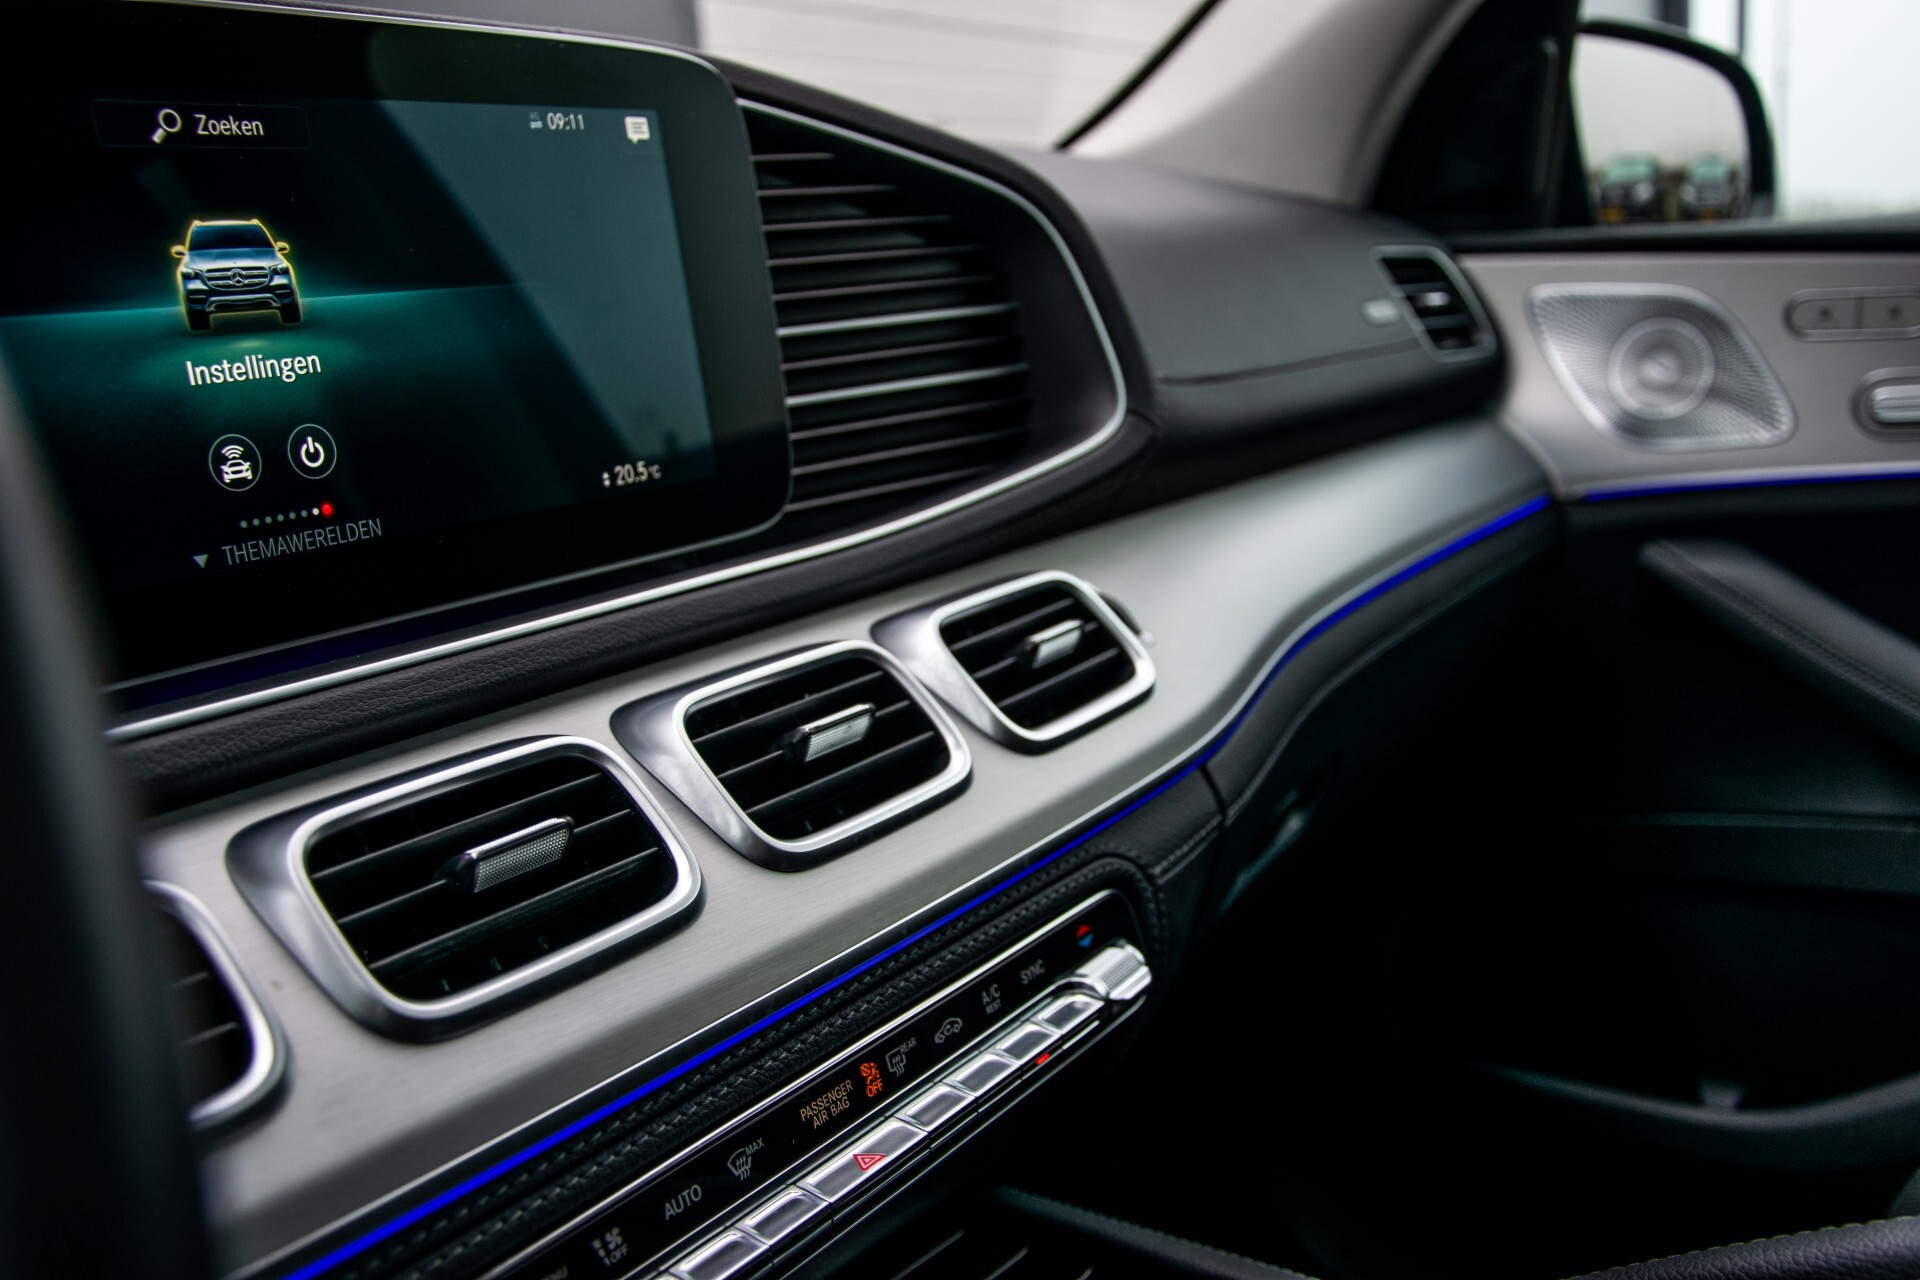 Mercedes-Benz GLE 450 4-M 7-Persoons AMG Massage/Rij-assist/Keyless/TV/360/Night/Trekhaak Aut9 Foto 62